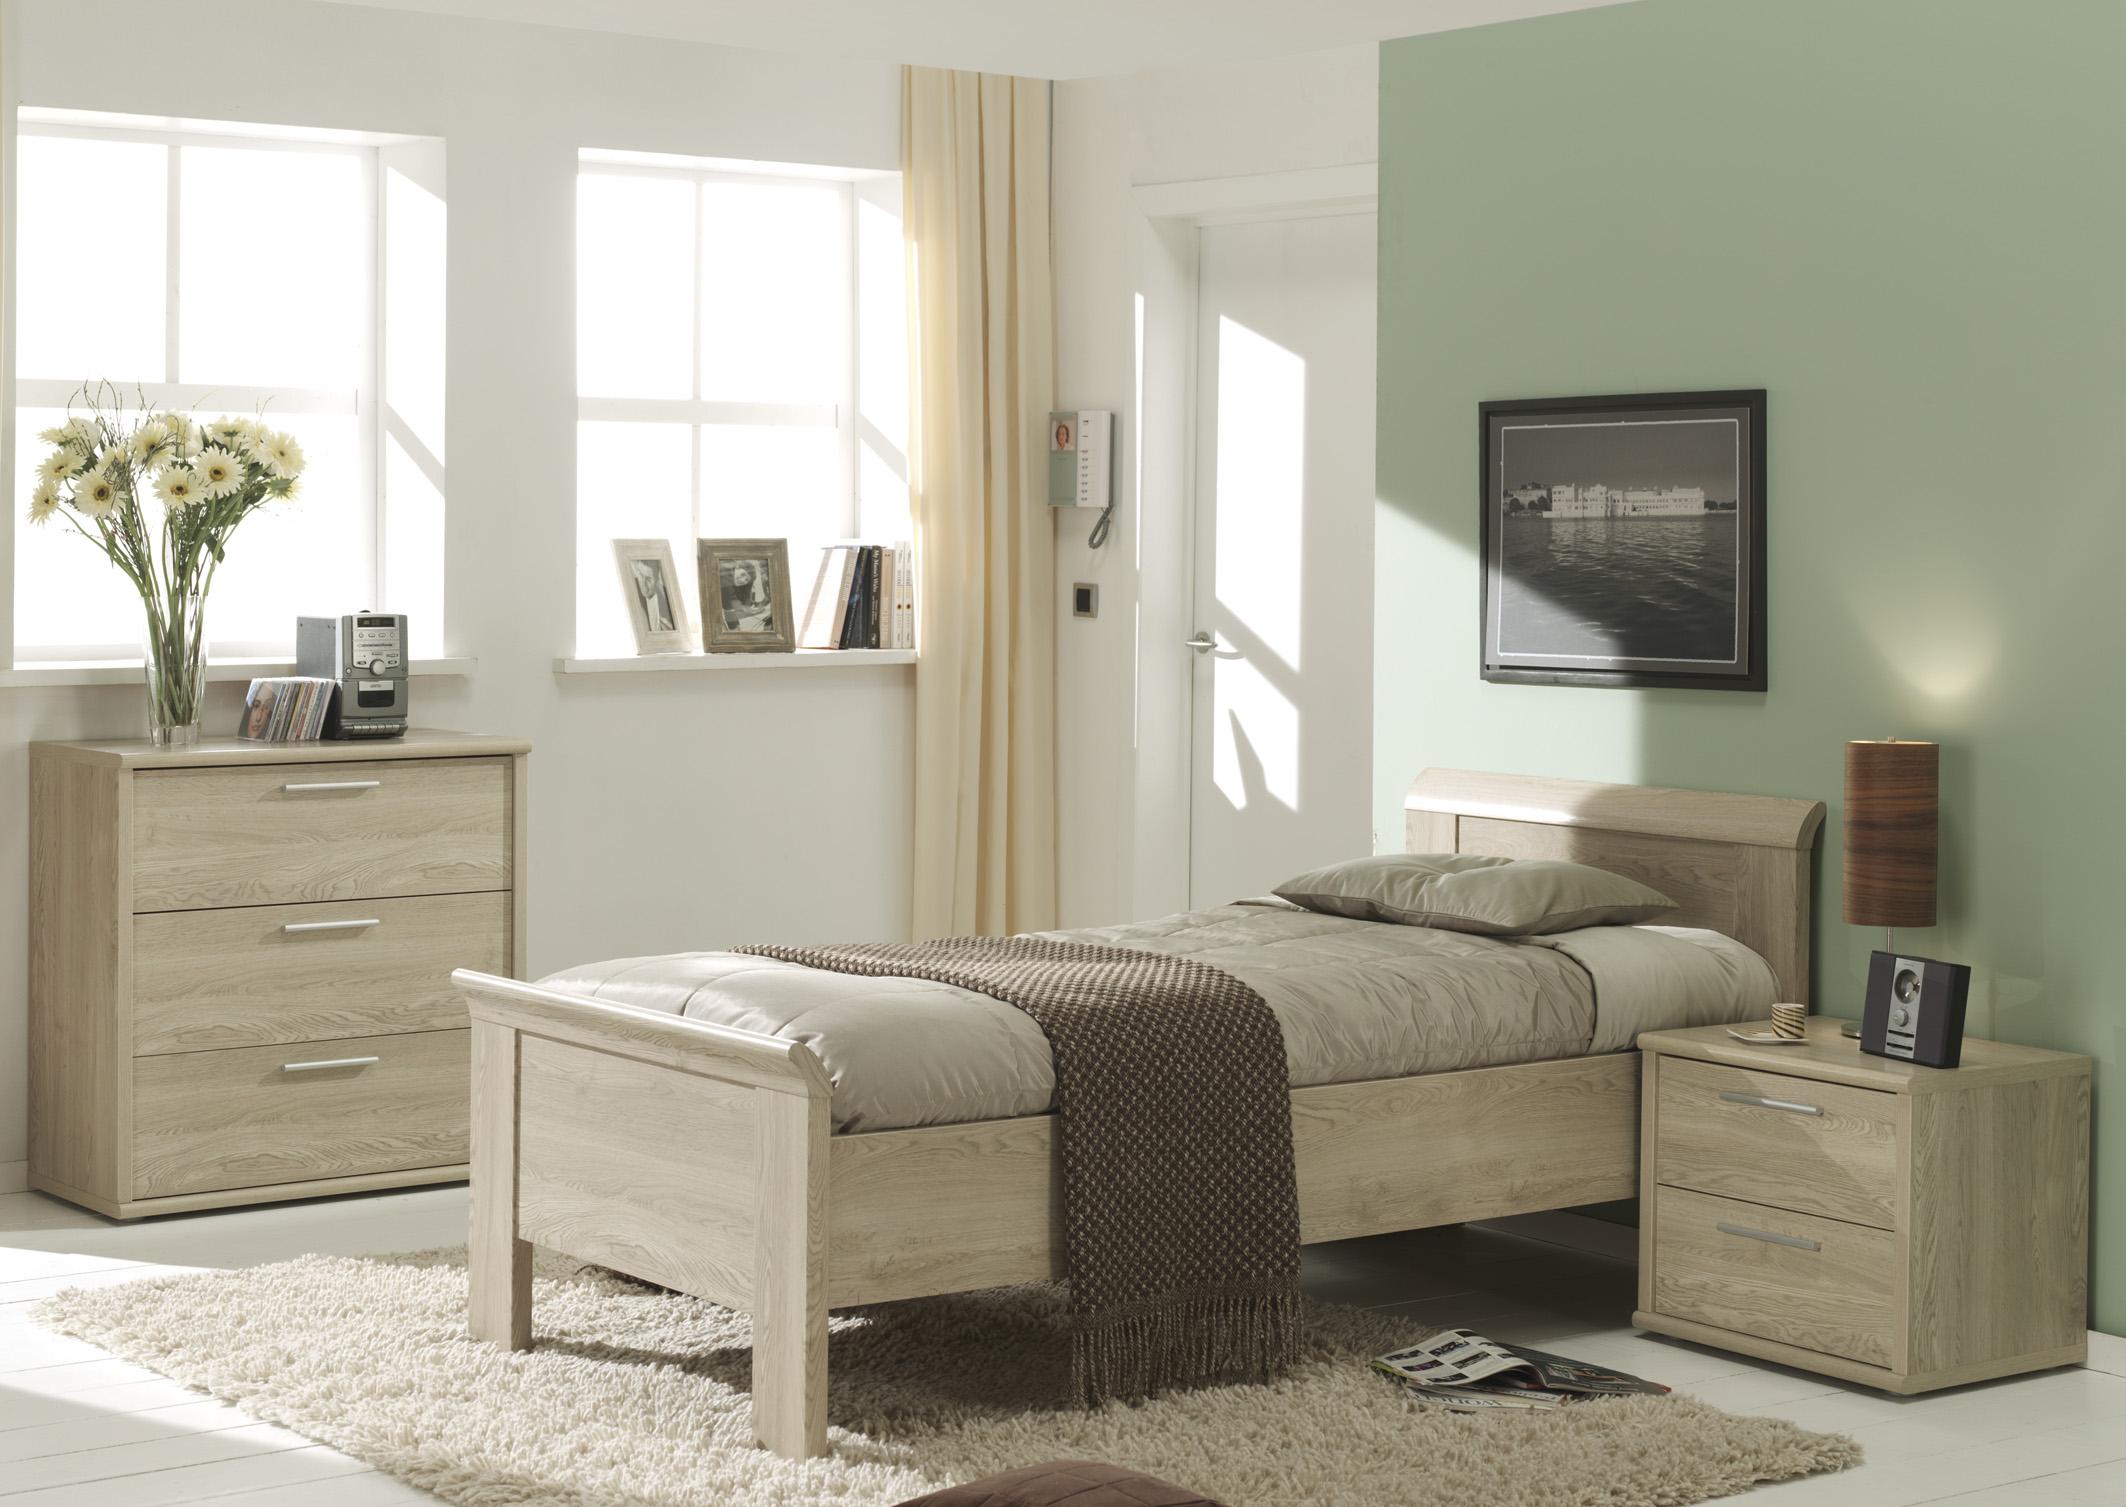 Baby Slaapkamer Nina : Kinderkamer nina meubelen de keizer tilt